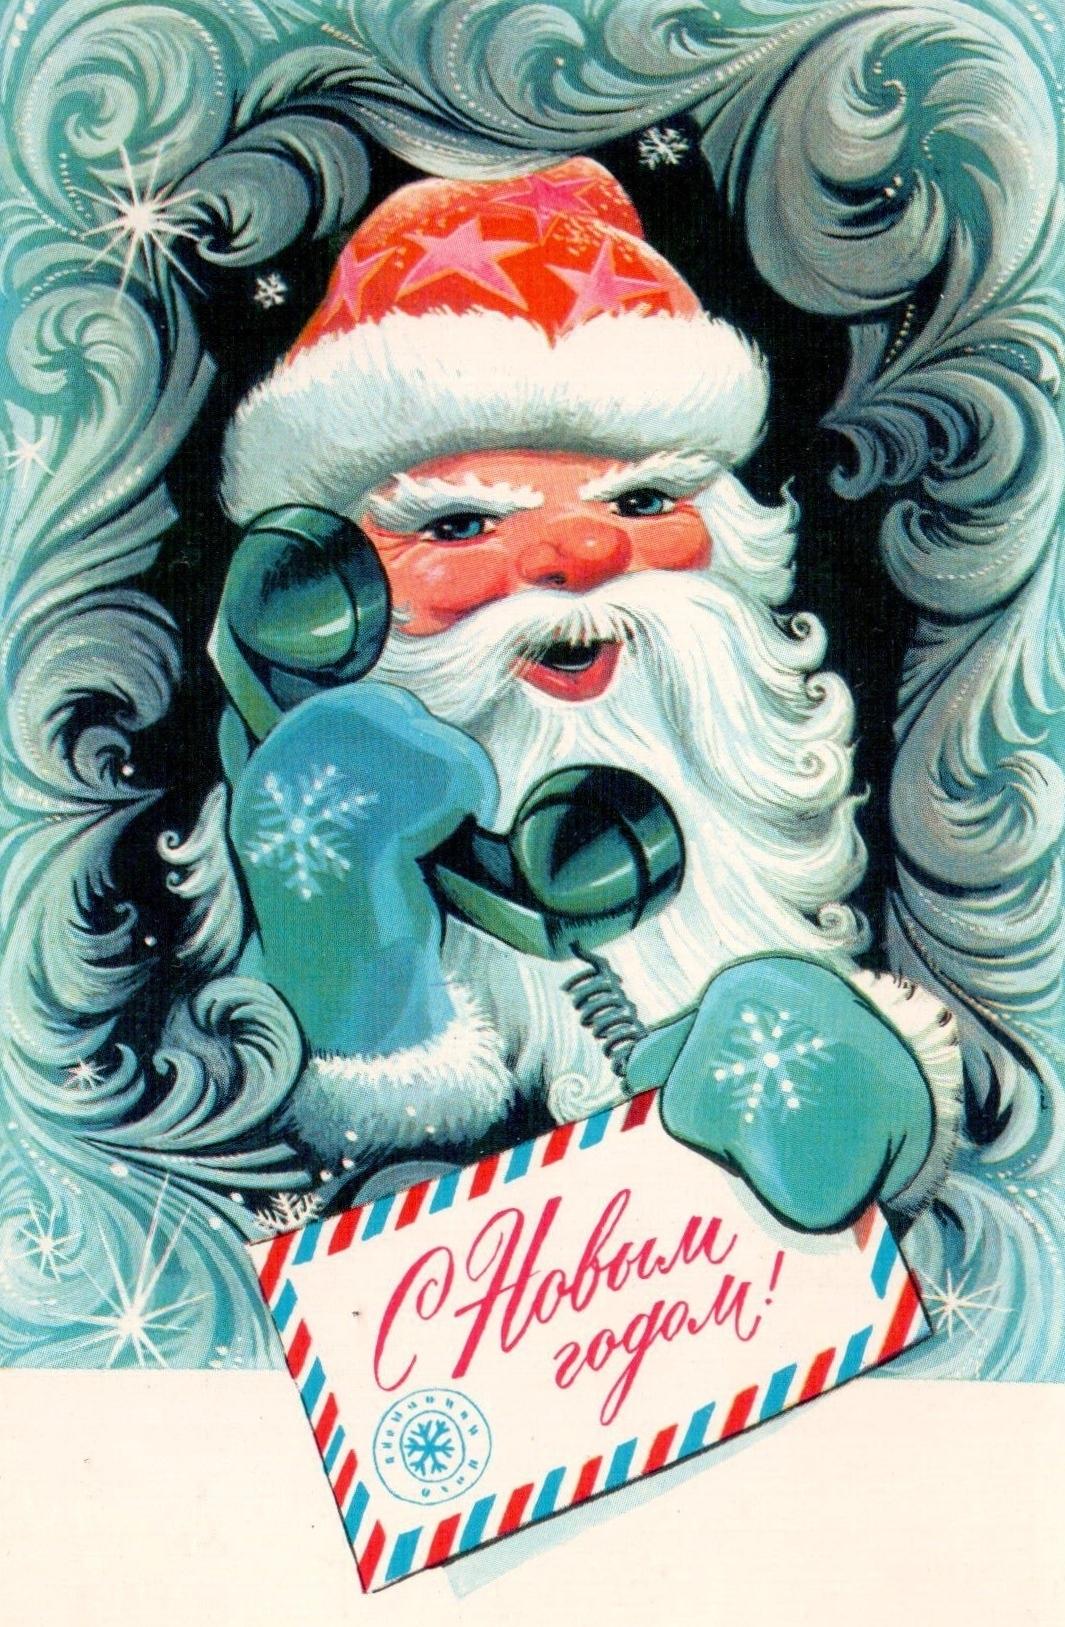 Фото дню, открытки с советский дед мороз